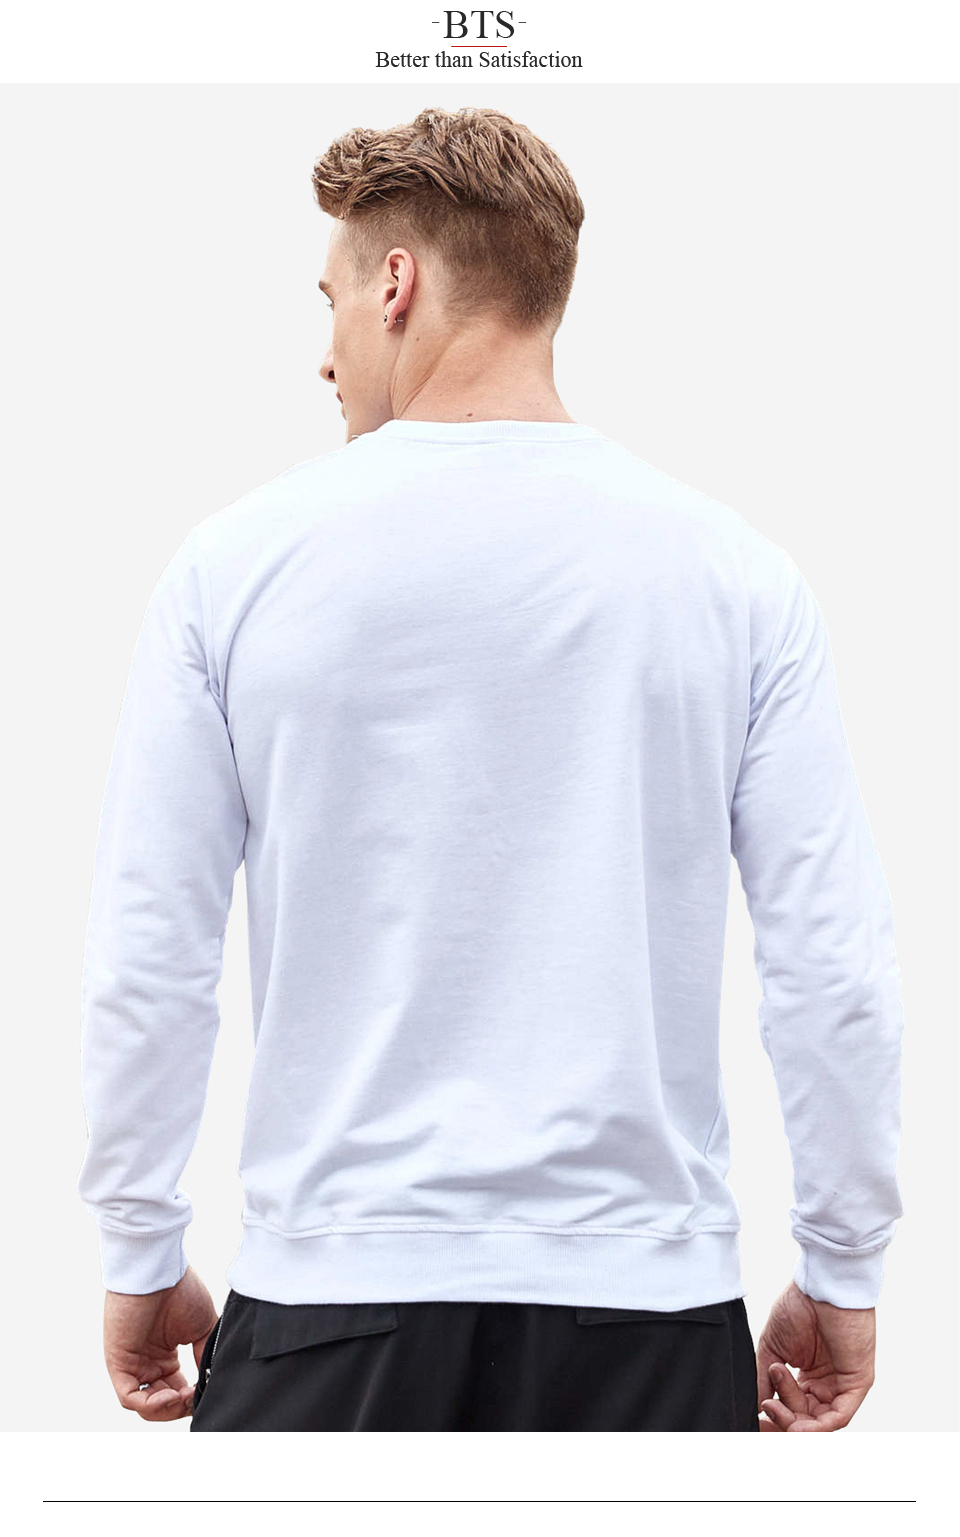 BTS David Guetta Man Hoodies Men Plus Size Creative Hipster Brand Sweatshirt Men Streetwear Cool Hoodies Sweatshirt Boys